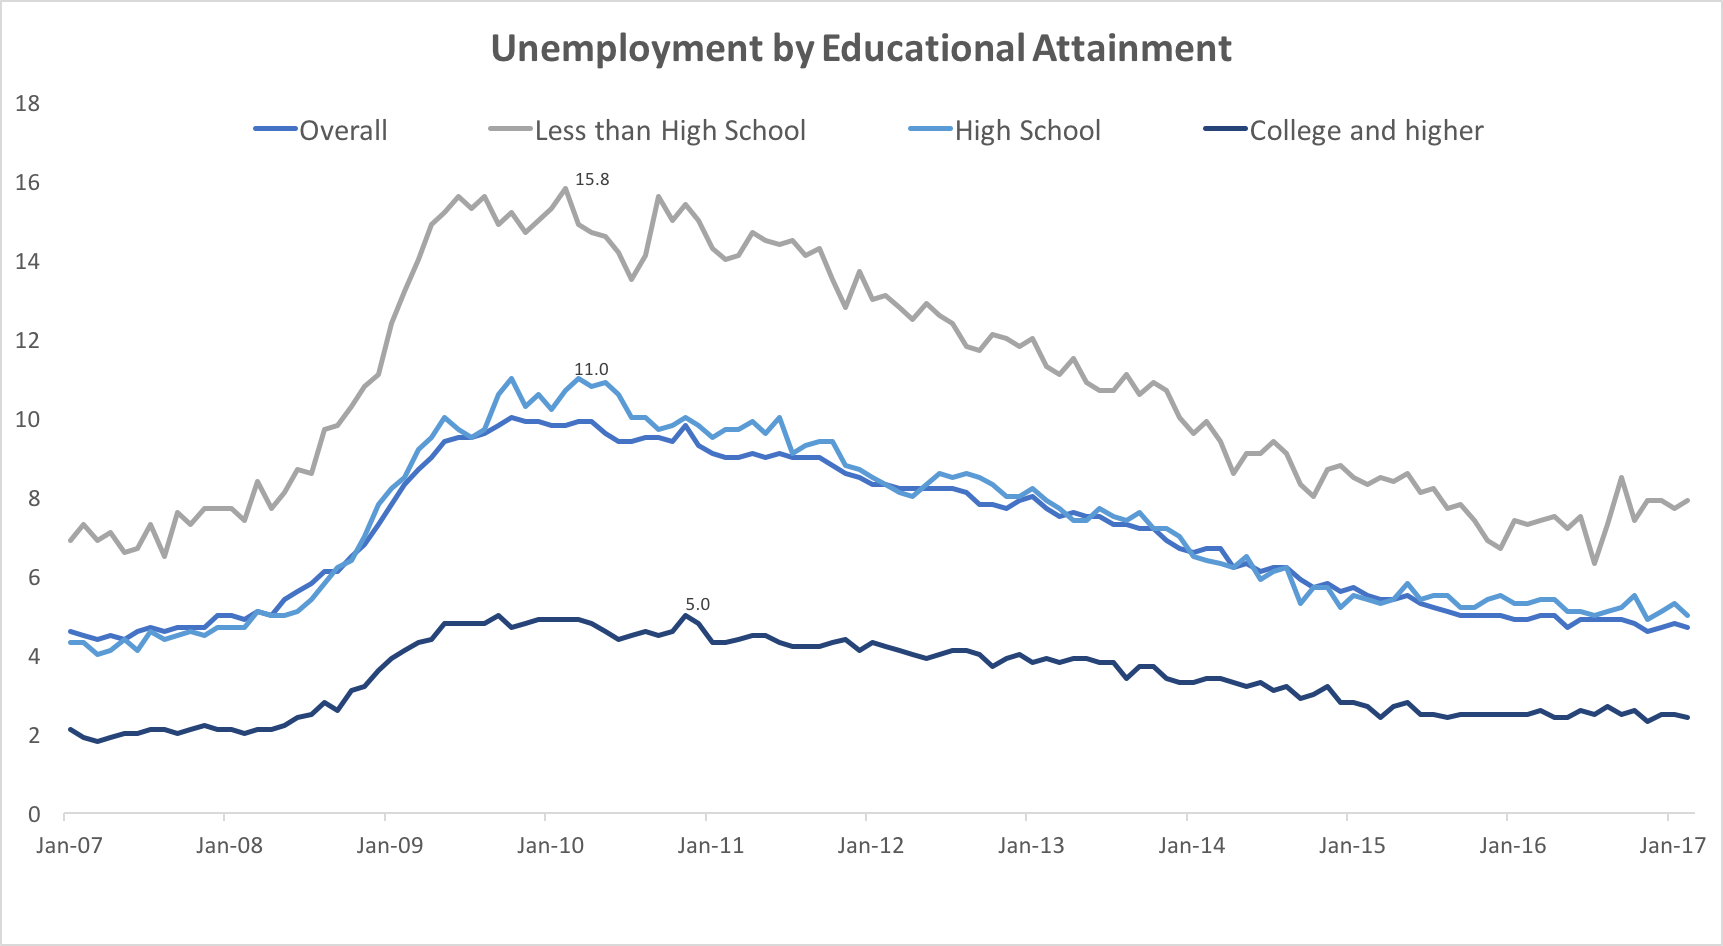 UnemploymentbyEducationLevel.png